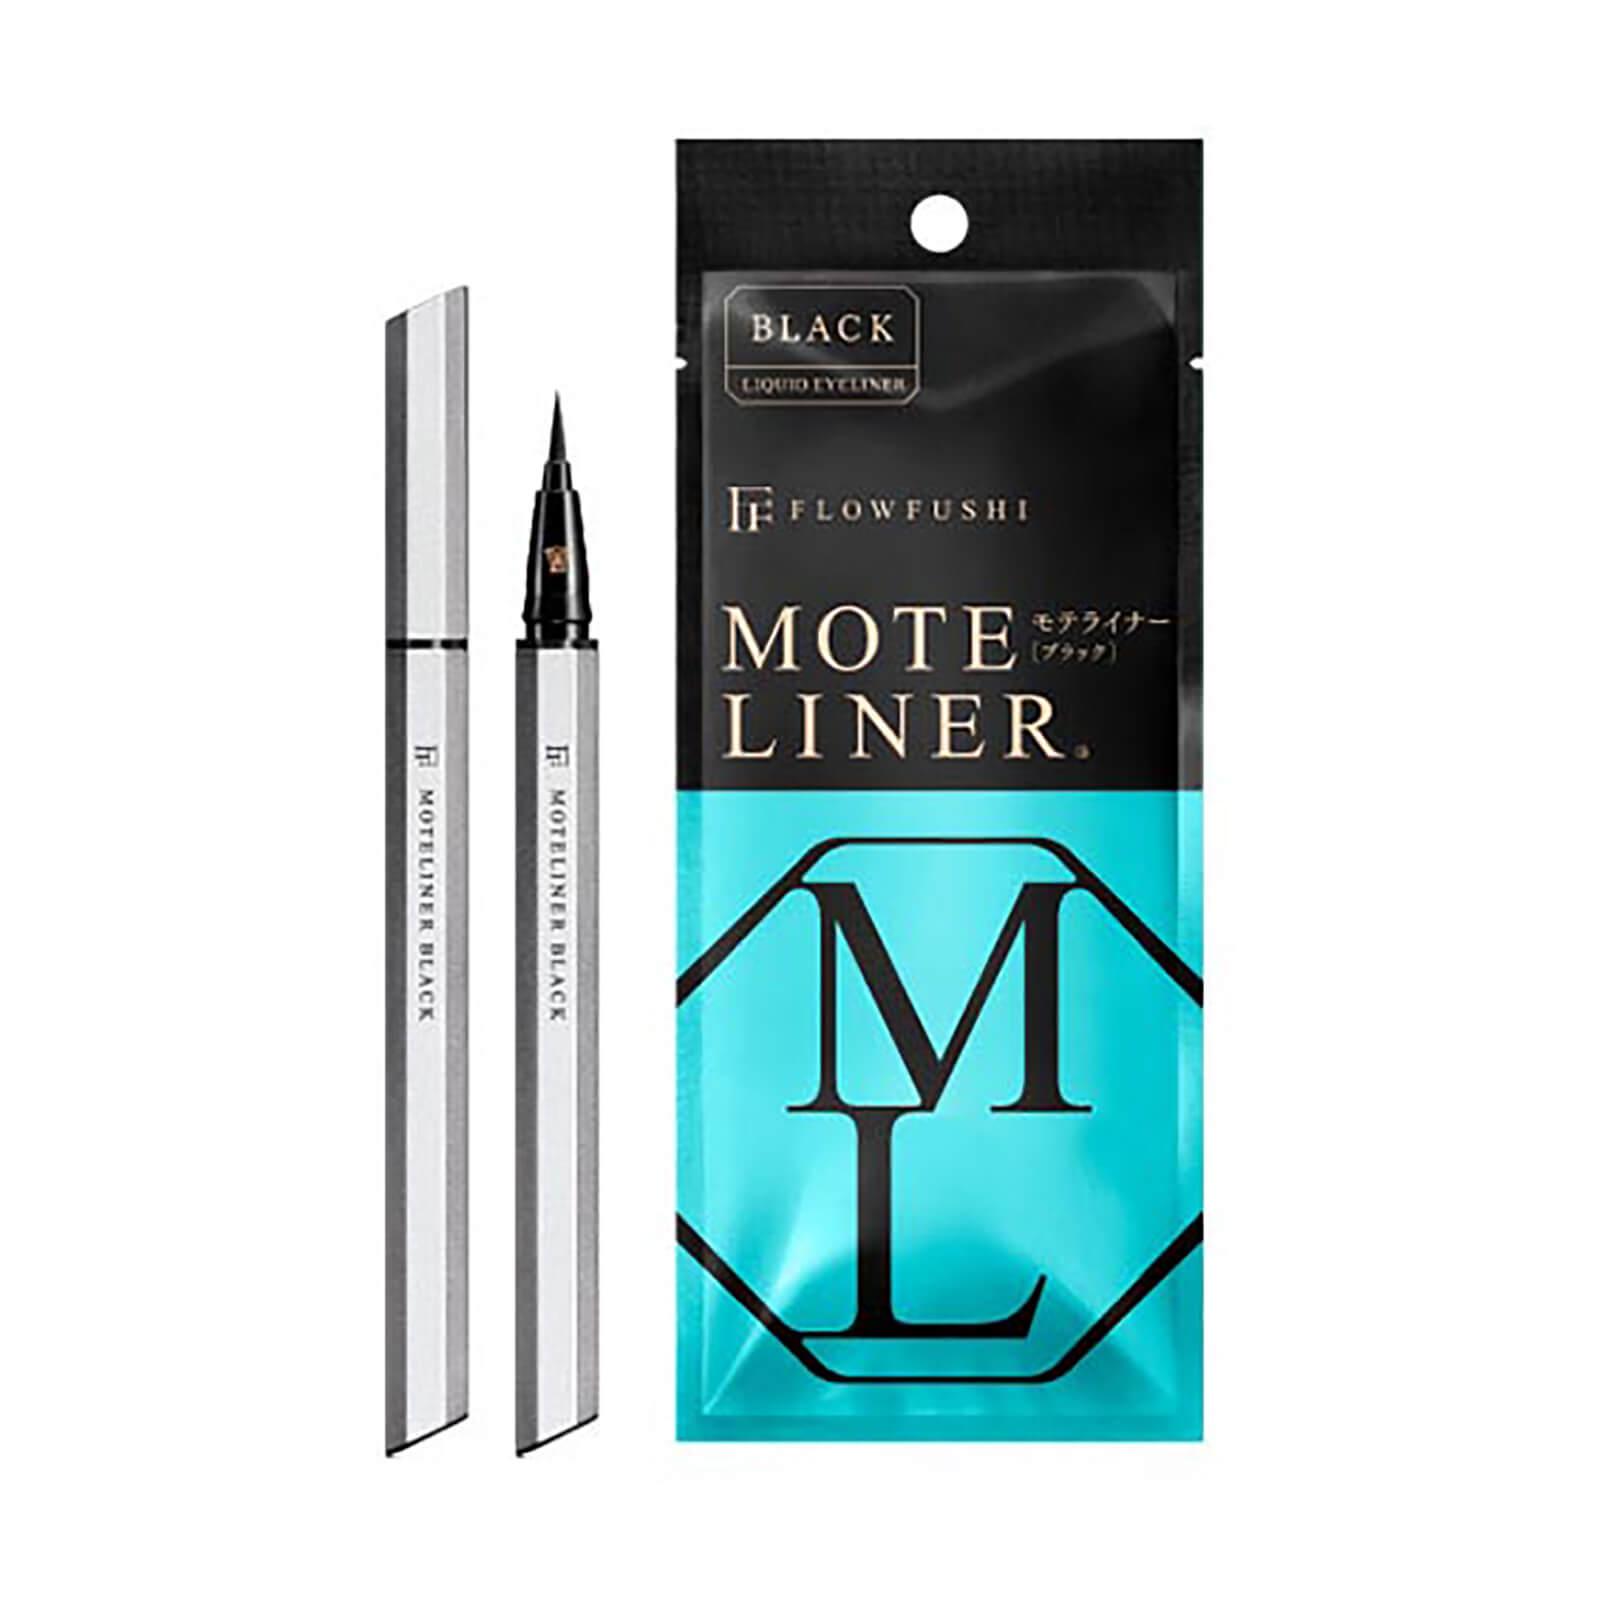 cec15a20c15 FLOWFUSHI Moteliner Takumi Liquid Eyeliner | SkinStore